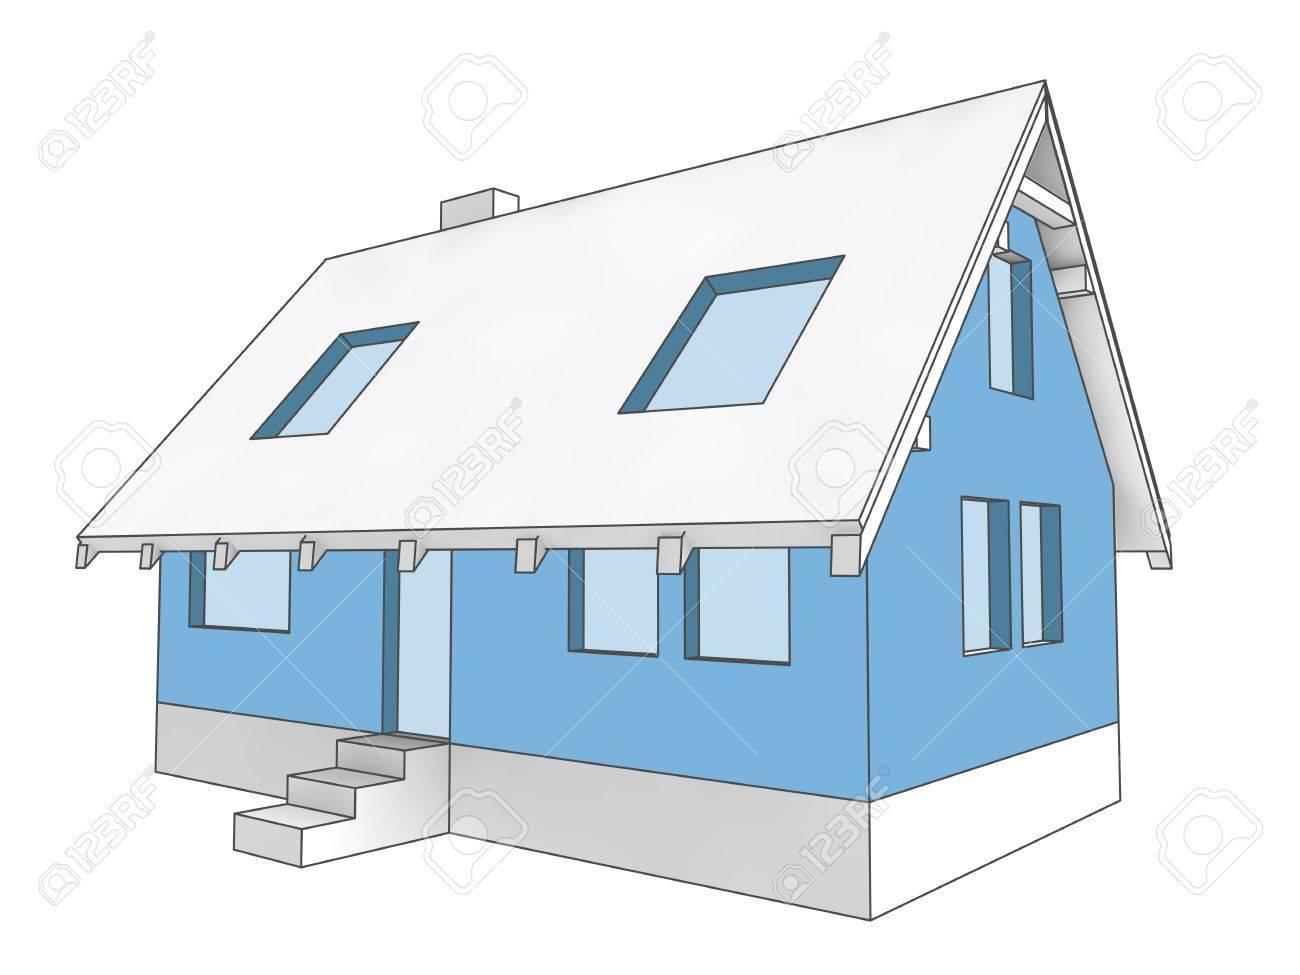 House Diagram - otoring.com